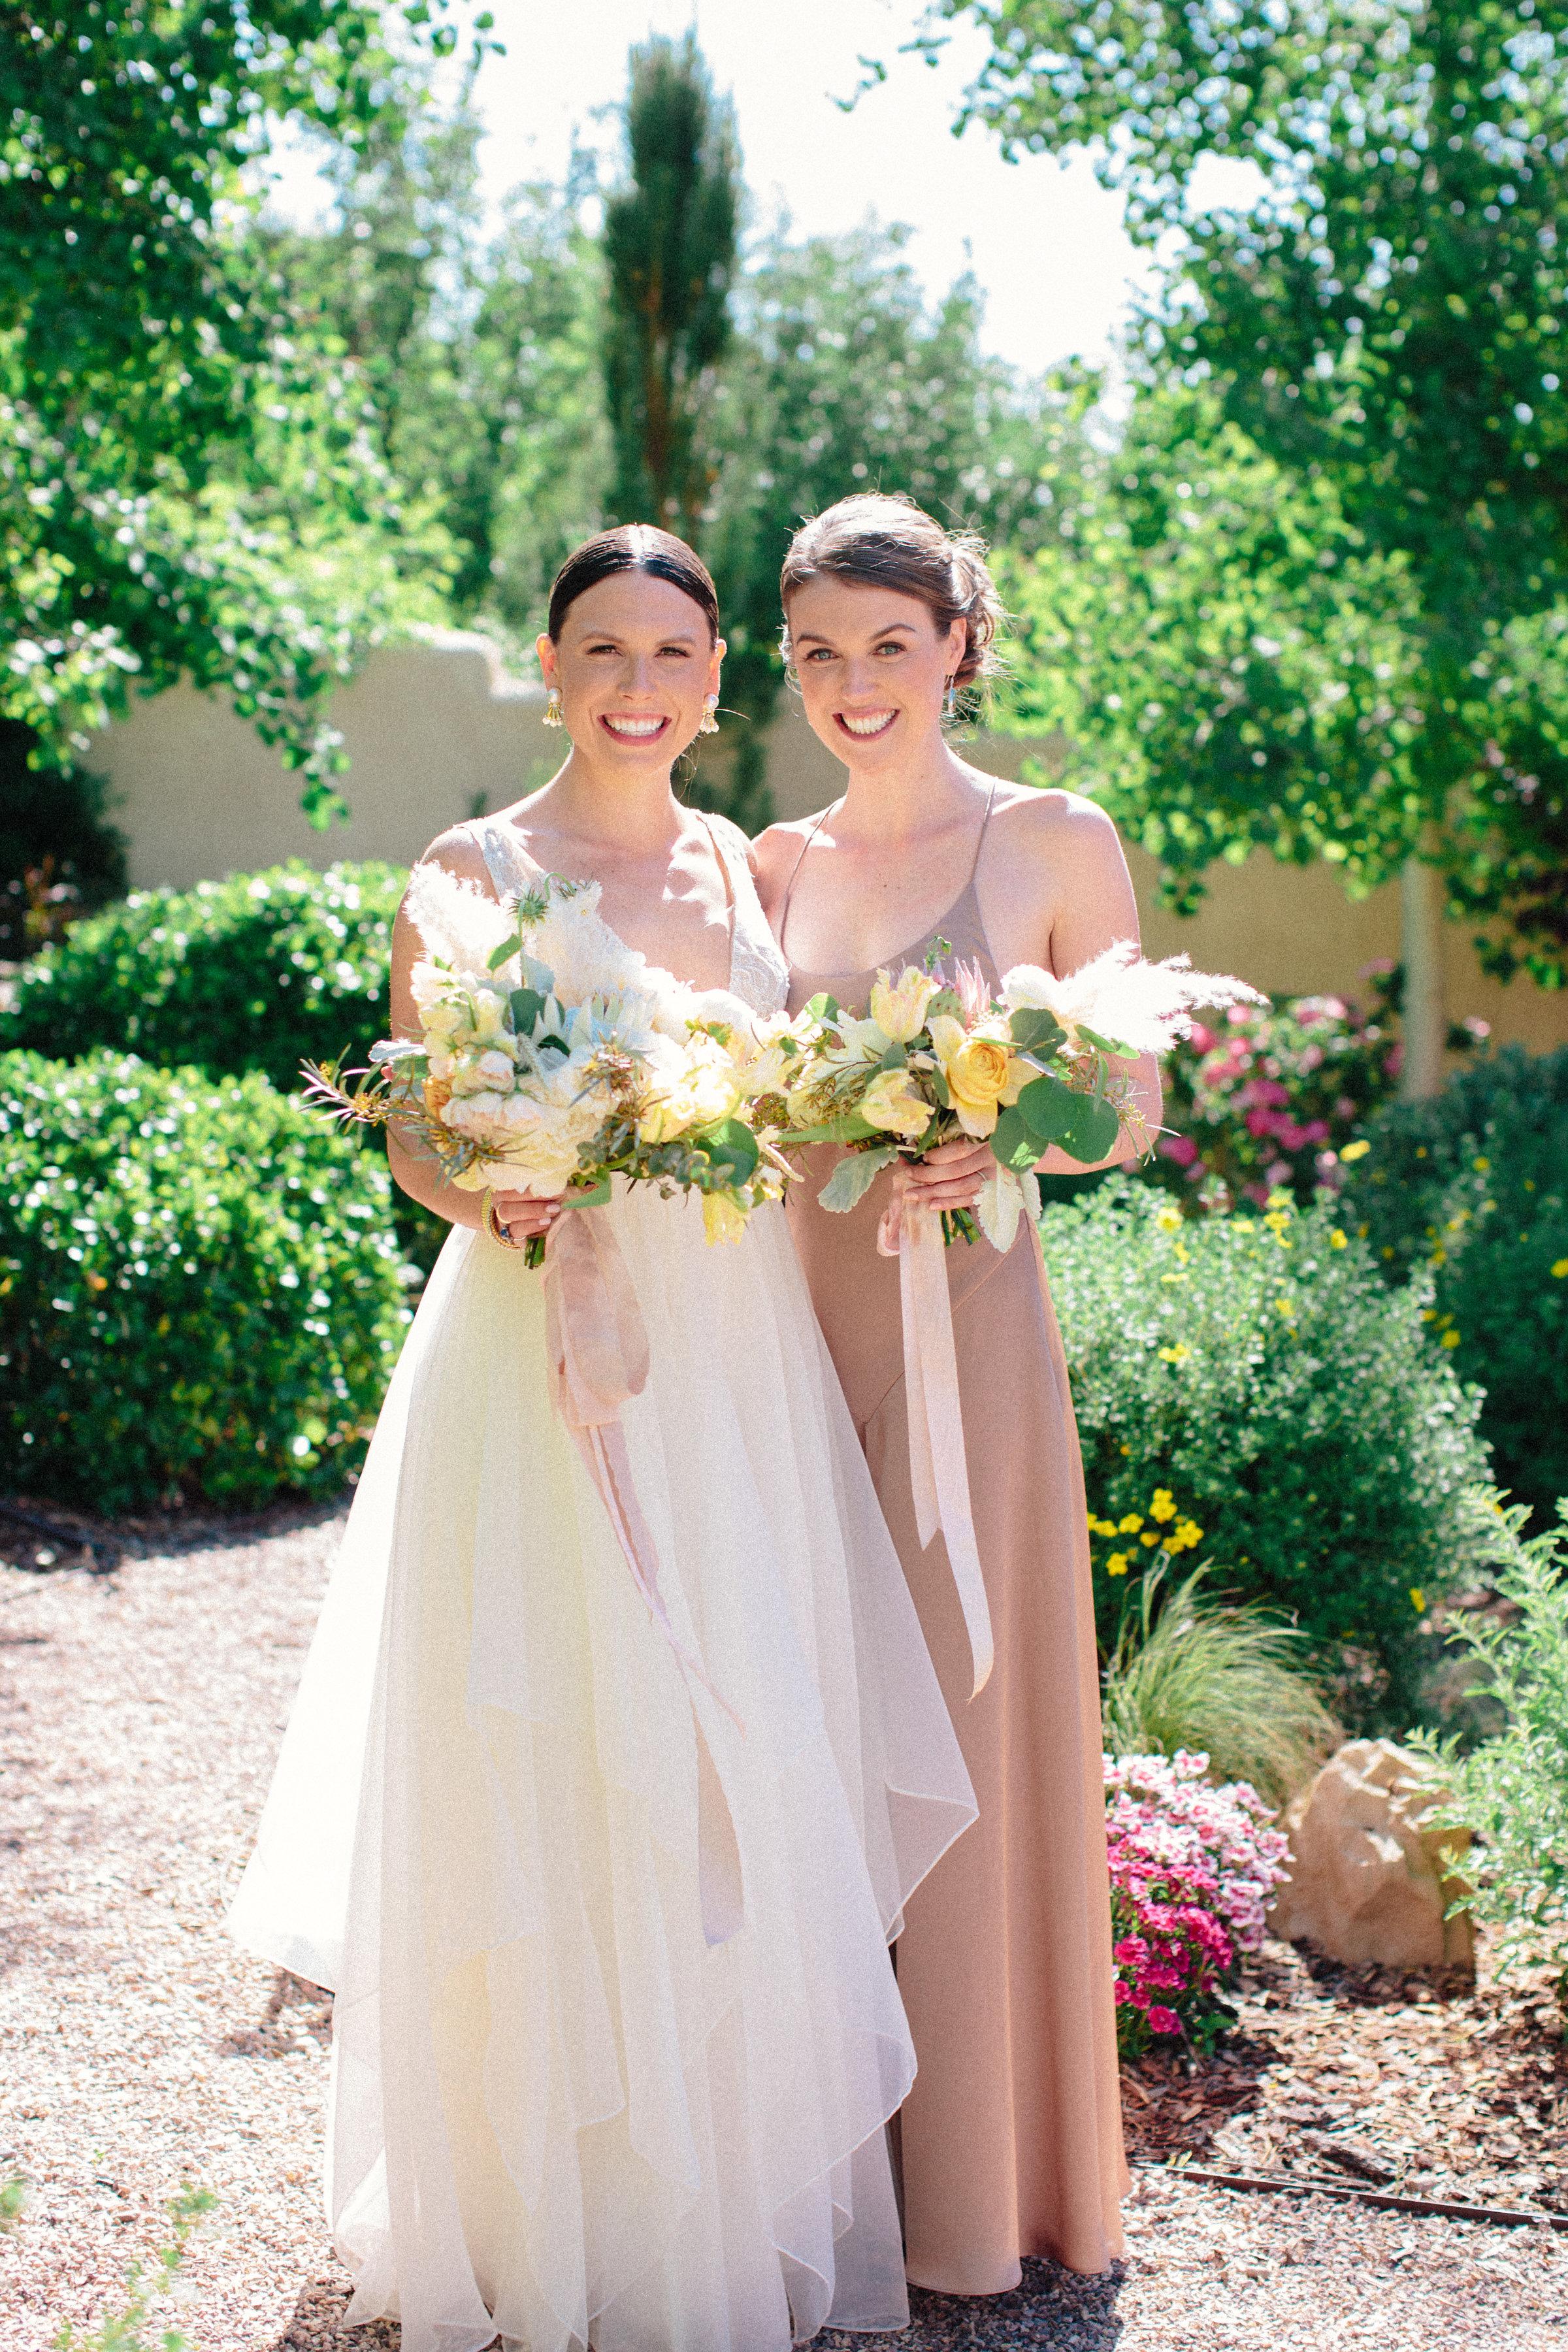 landry_lovelace_wedding_jbobephoto-251.jpg